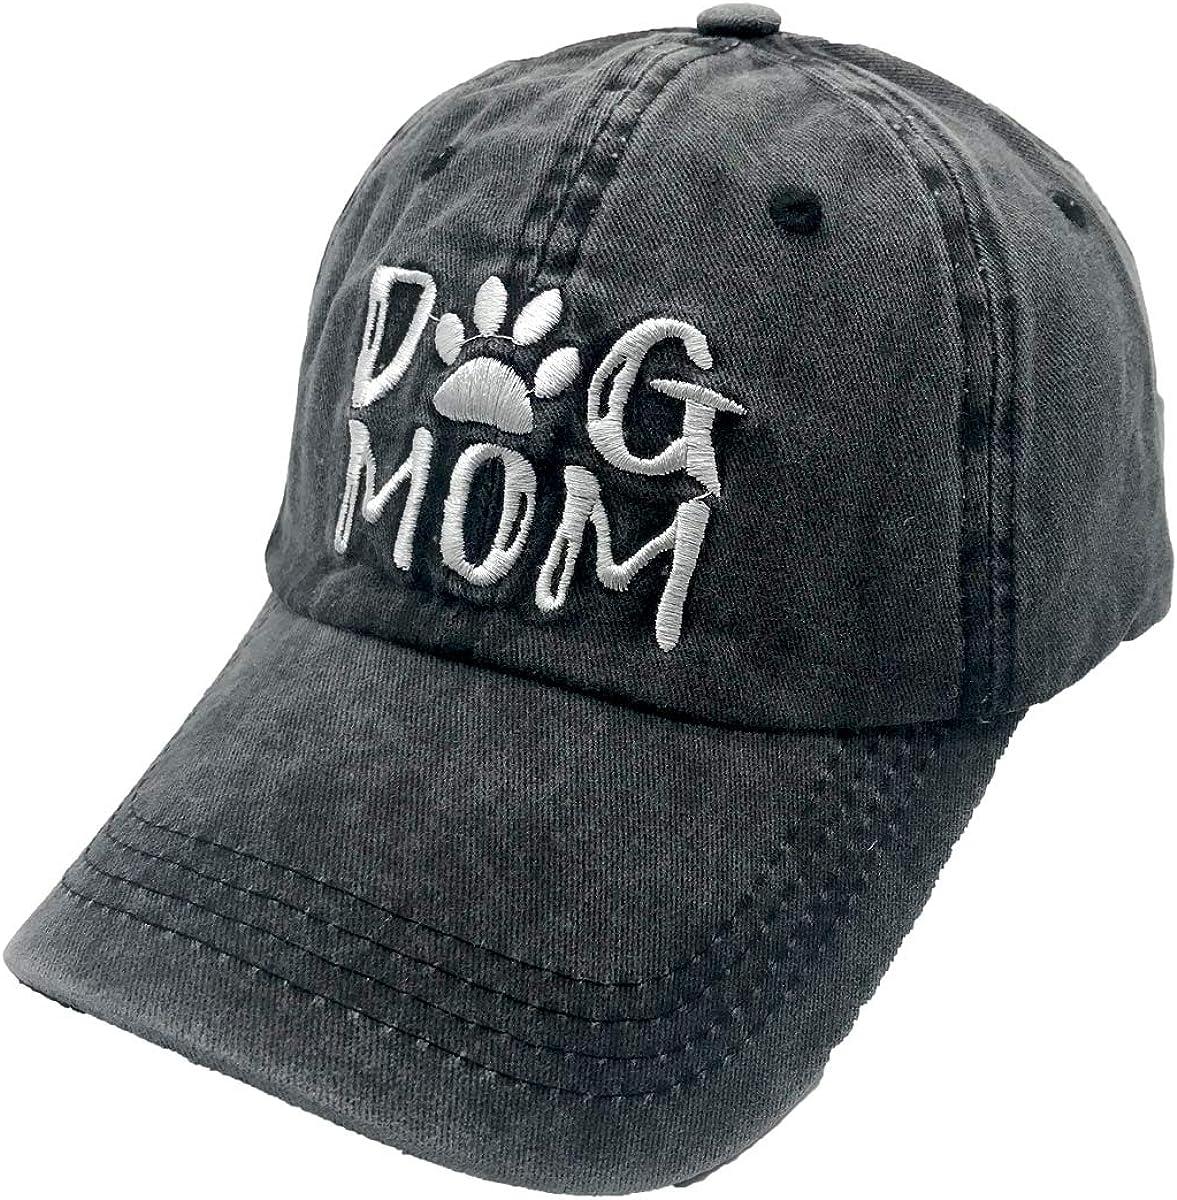 Vintage Baseball Cap Washed Dyed Cotton Dog Mom Adjustable Unisex Dad Hat